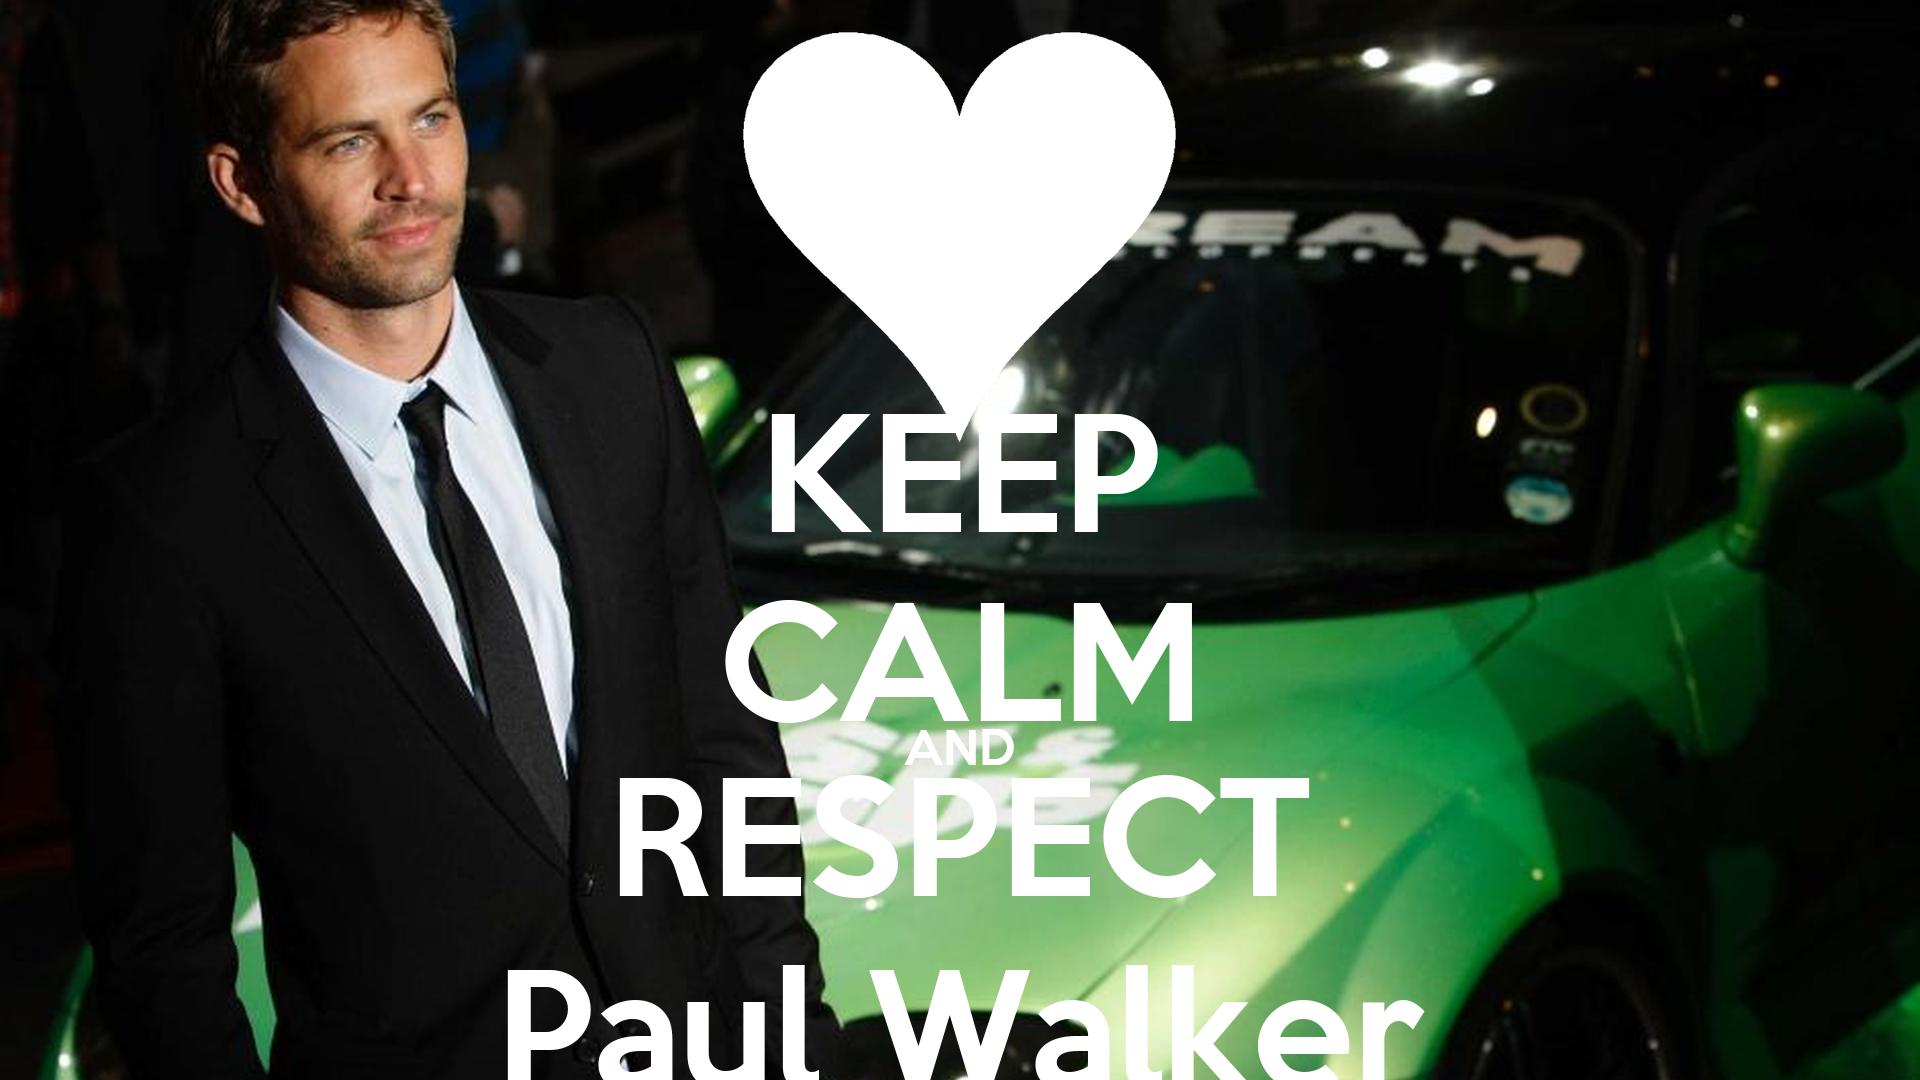 KEEP CALM AND RESPECT Paul Walker